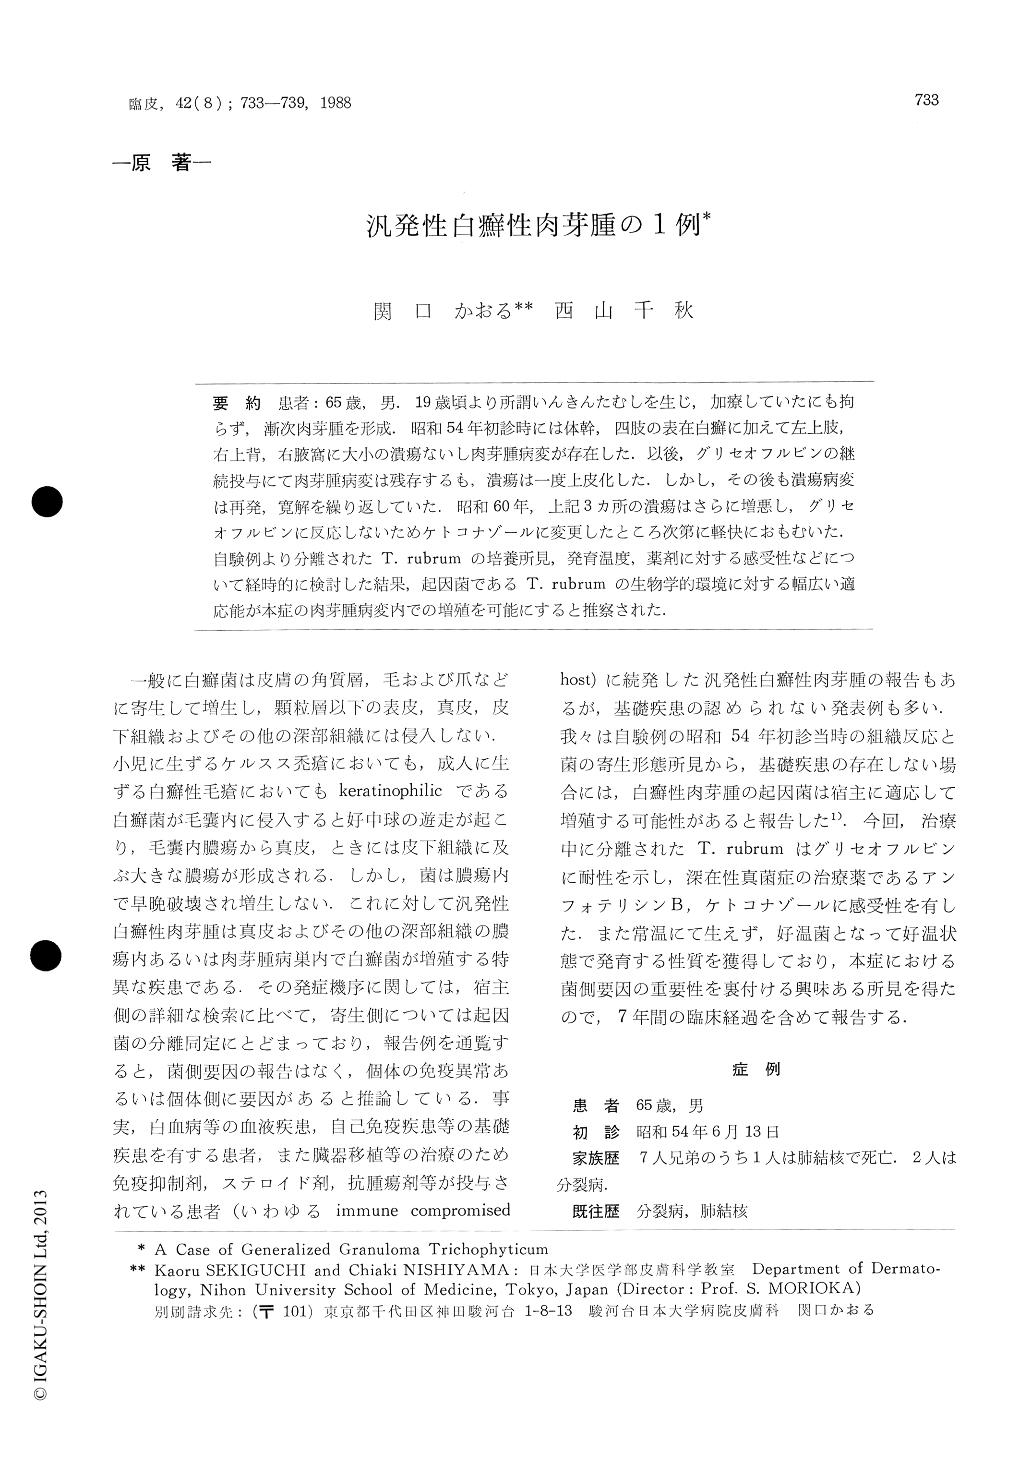 汎発性白癬性肉芽腫の1例 (臨床...